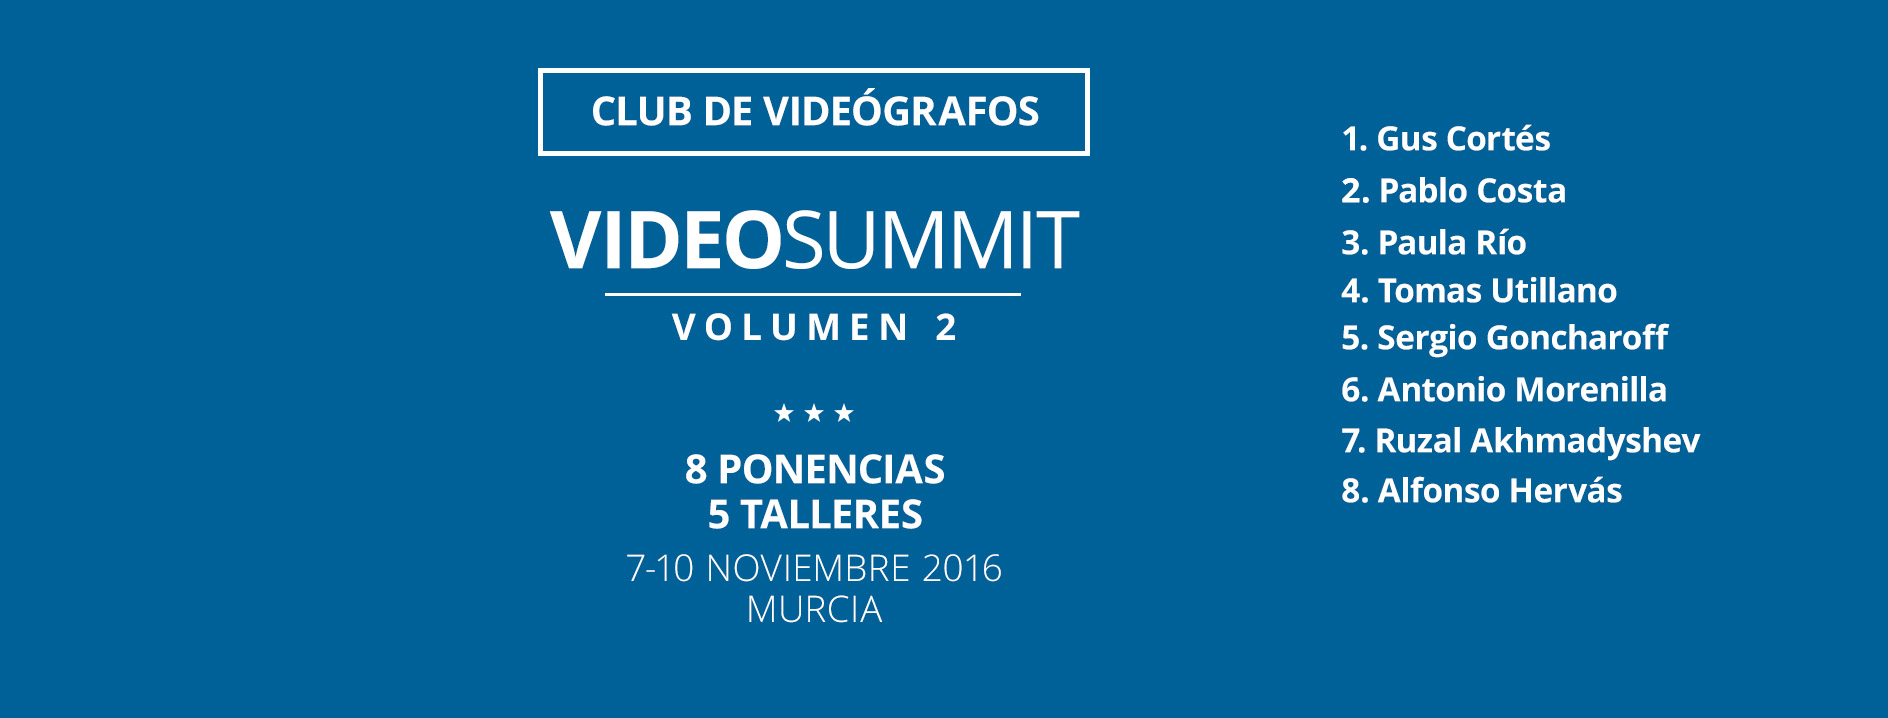 videoSUMMIT-MURCIA-ESPANA10715727639112_o